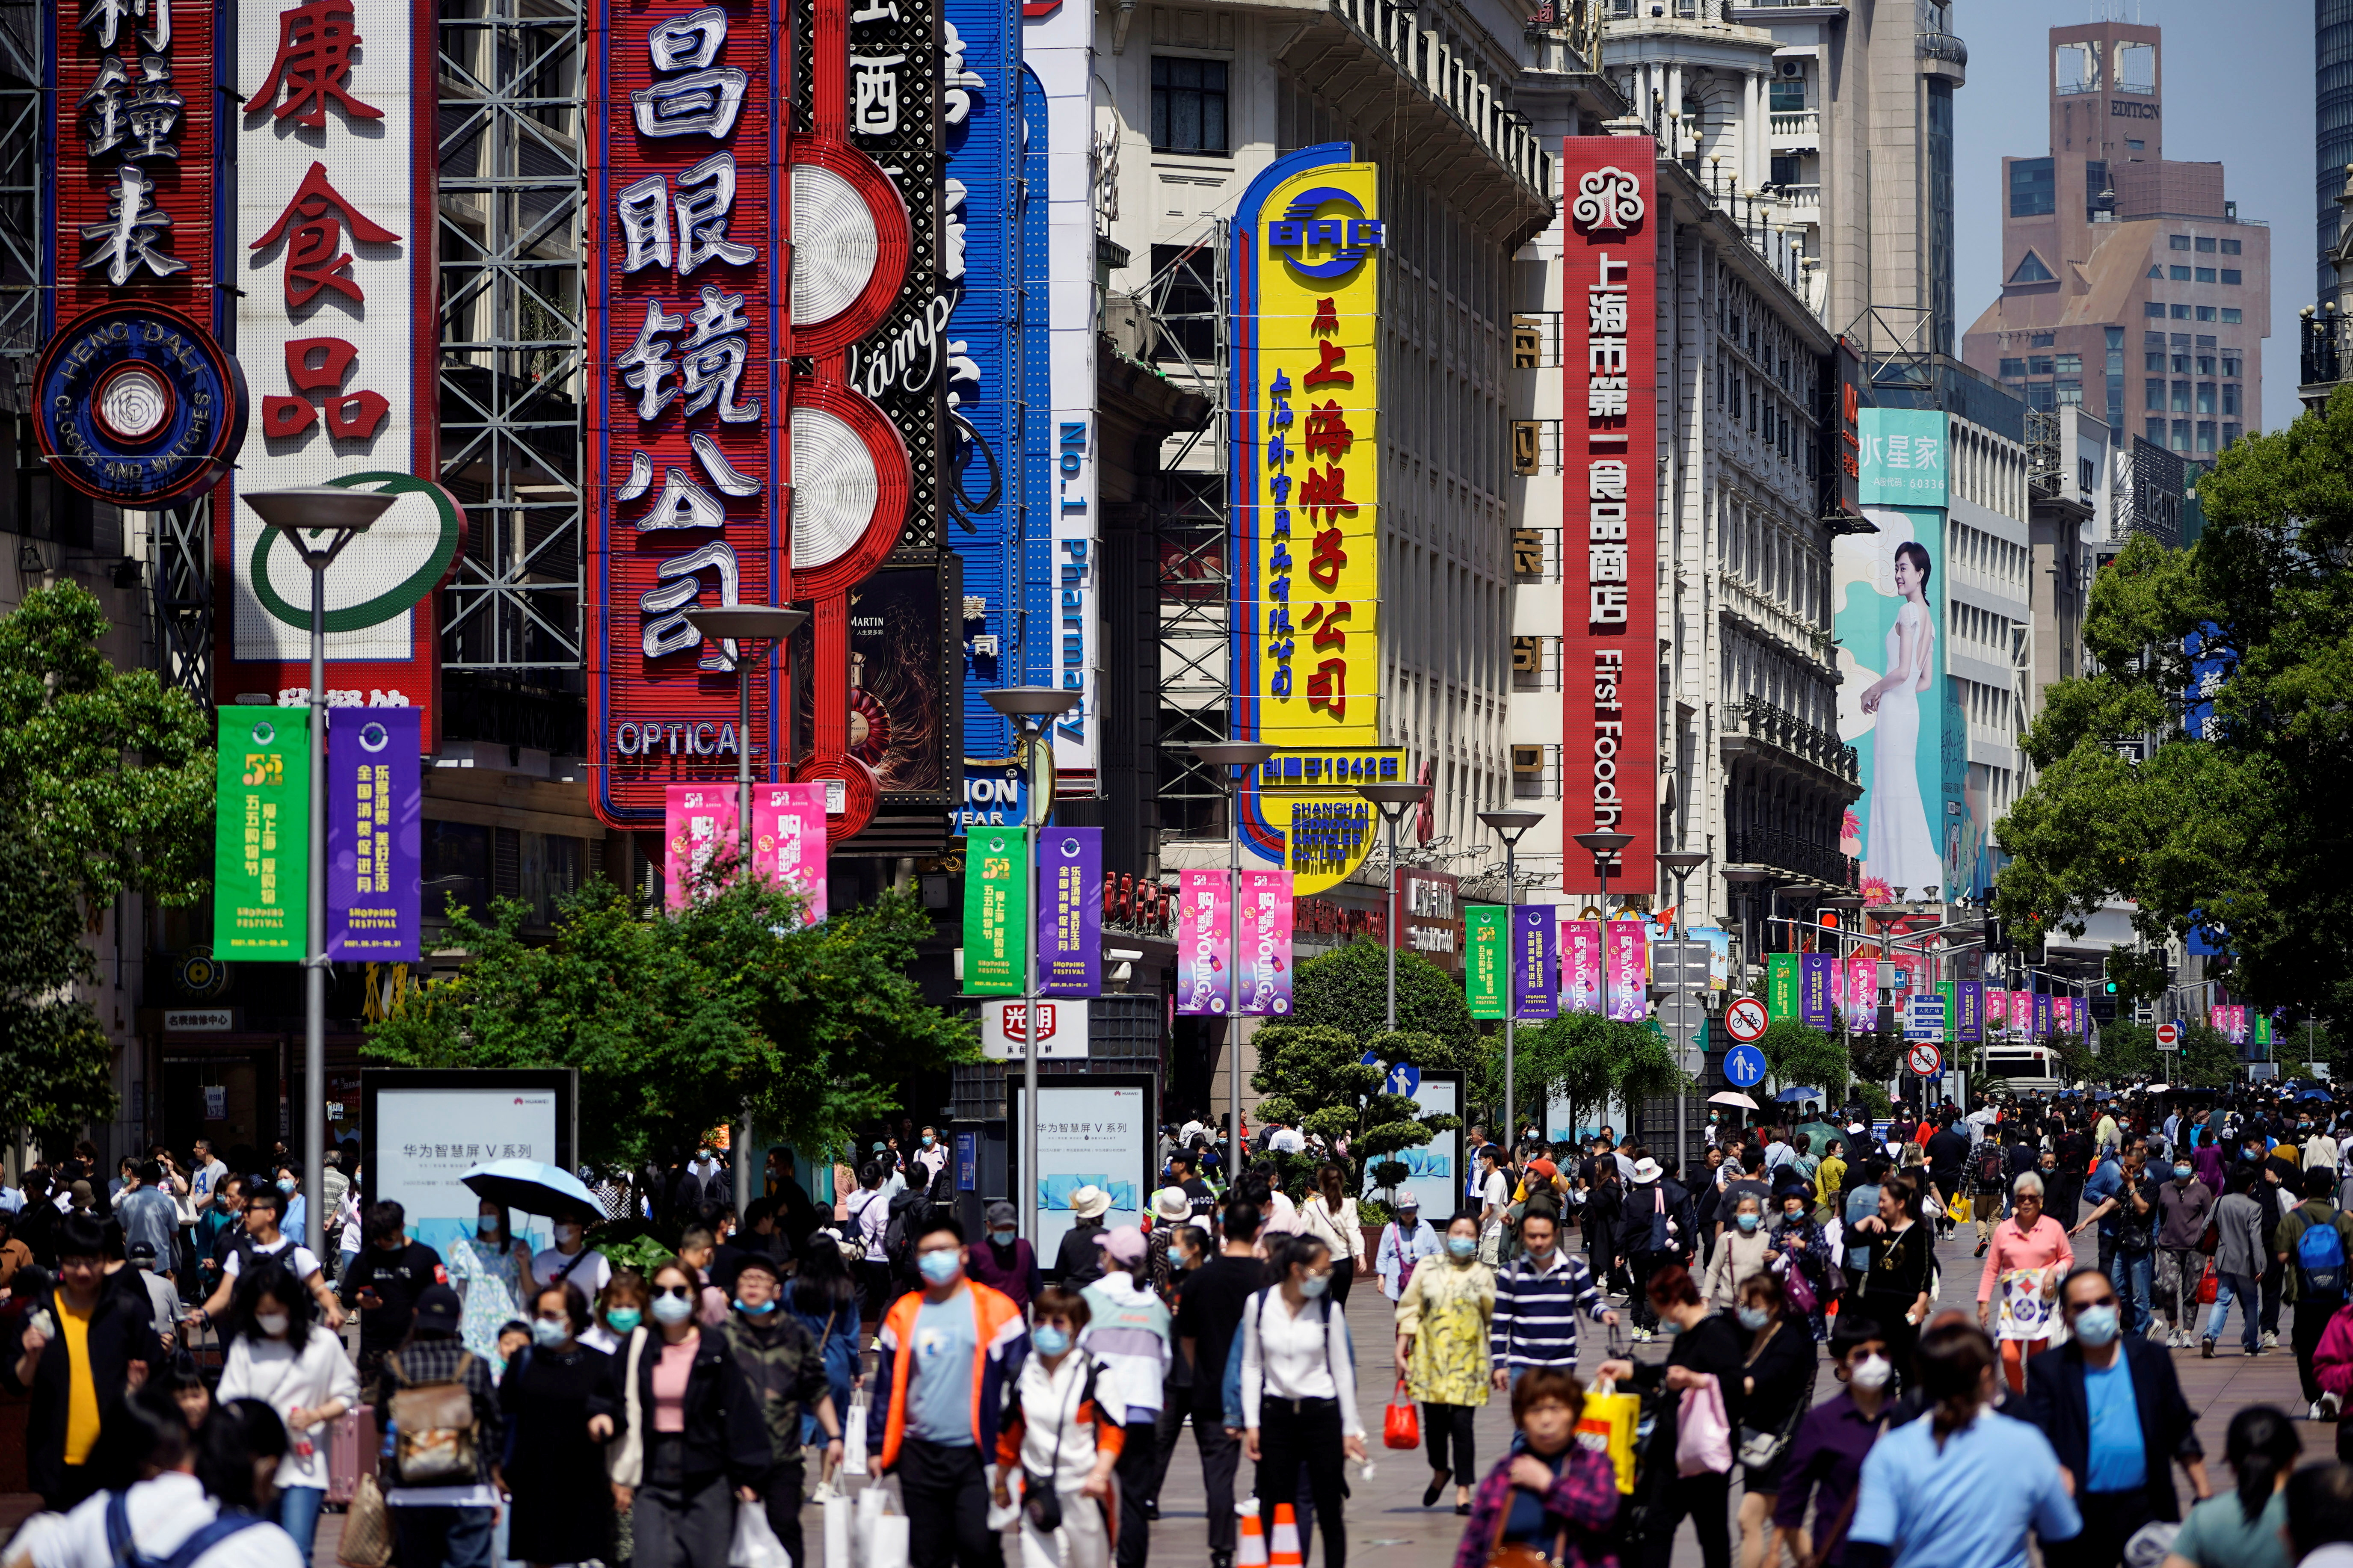 People walk along Nanjing Pedestrian Road, a main shopping area, in Shanghai, China May 5, 2021. REUTERS/Aly Song